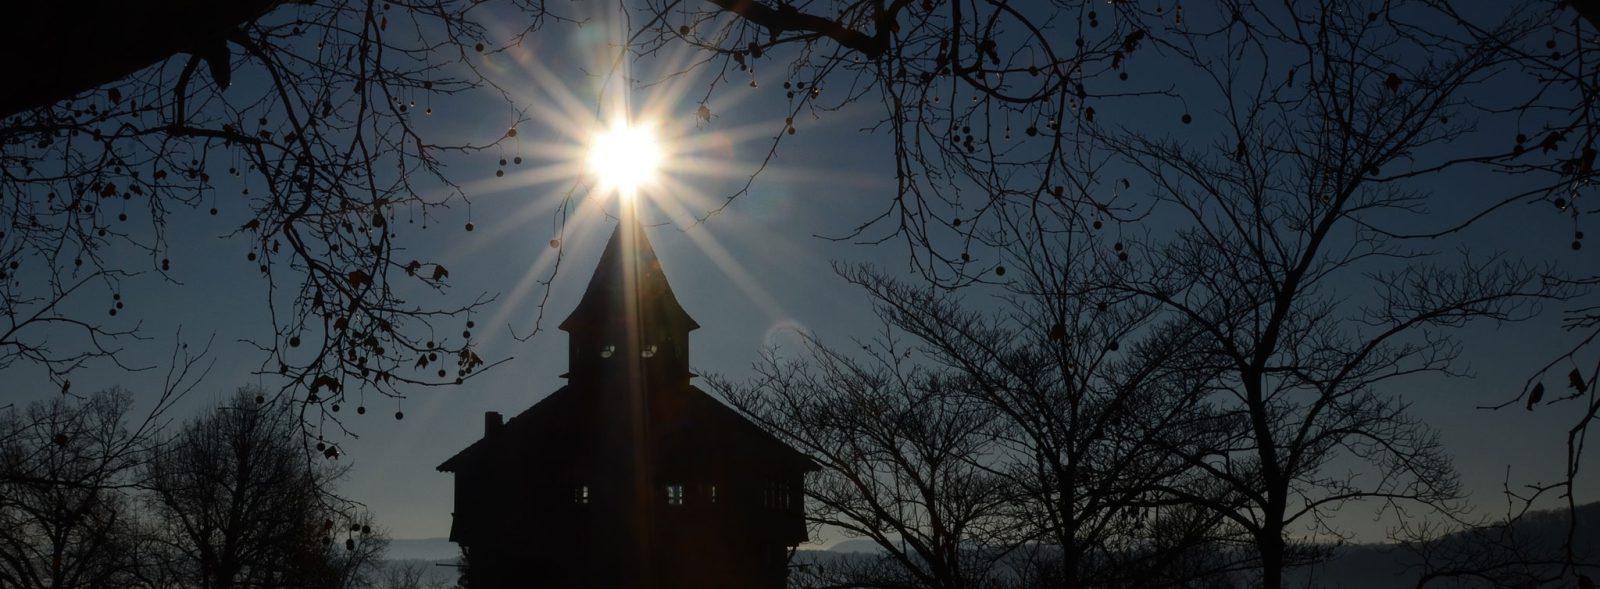 Dicker Turm Esslingen im Sonnenlicht